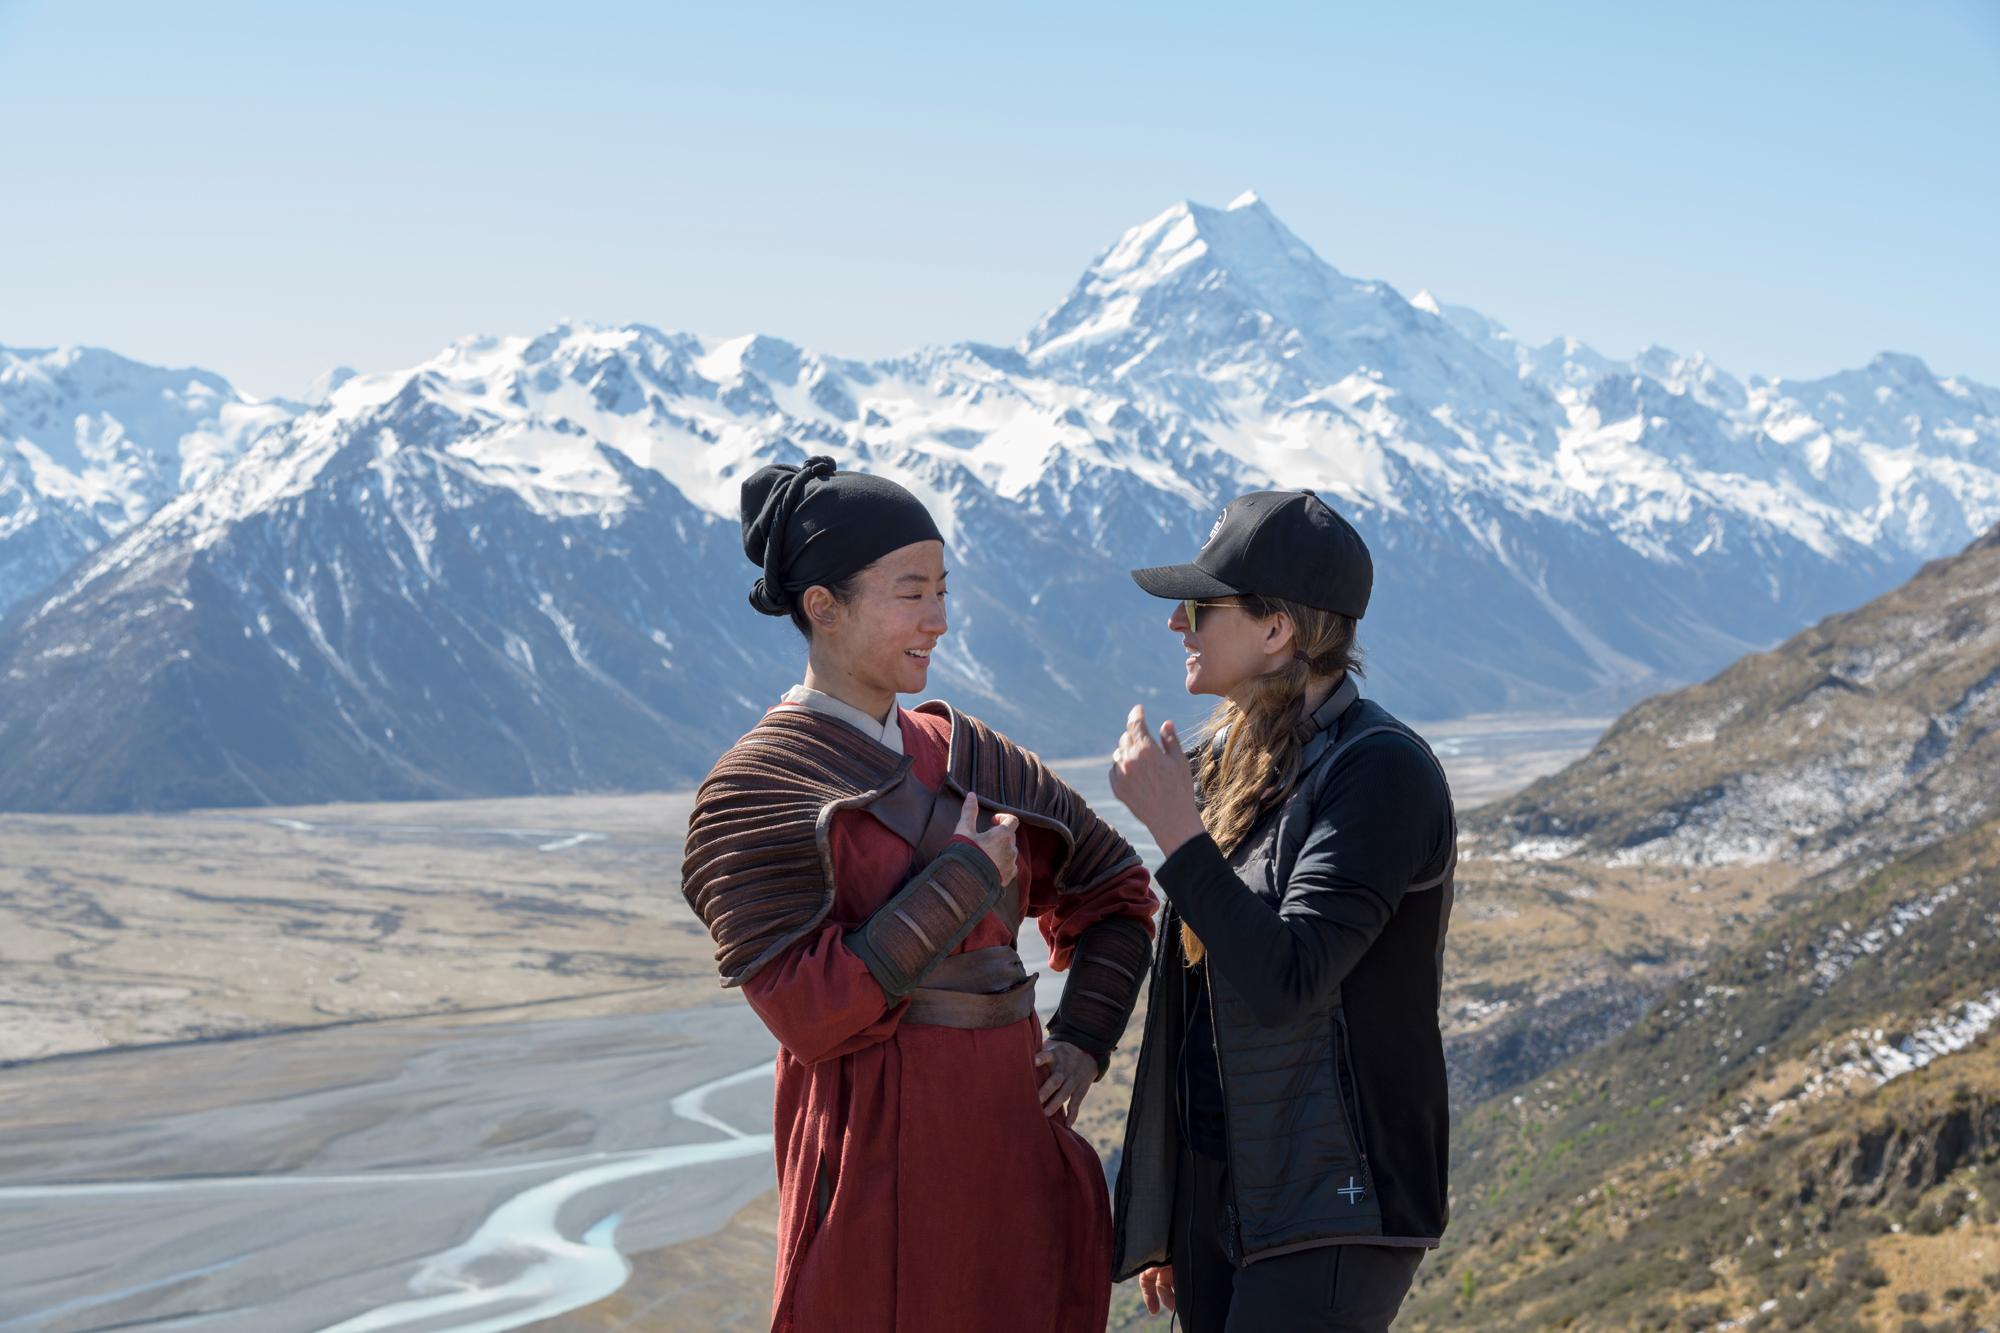 Yifei Liu (Mulan) on set with Director Niki Caro